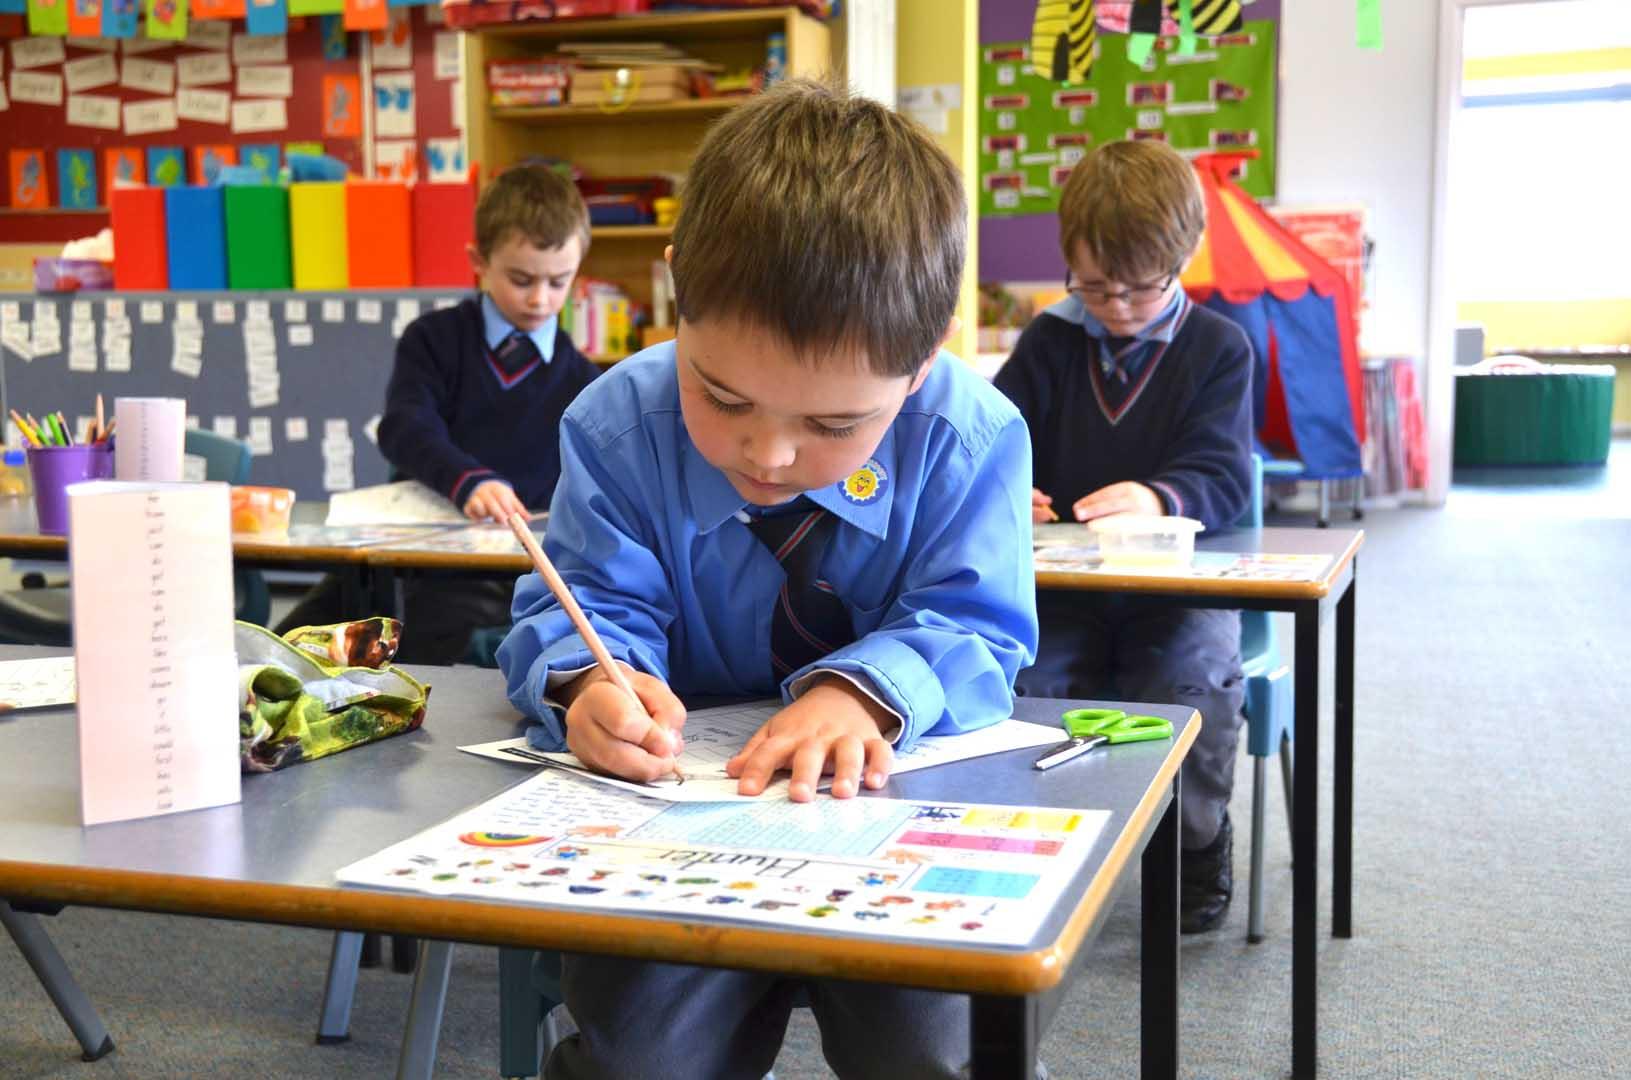 St-Patricks-walcha-classroom999